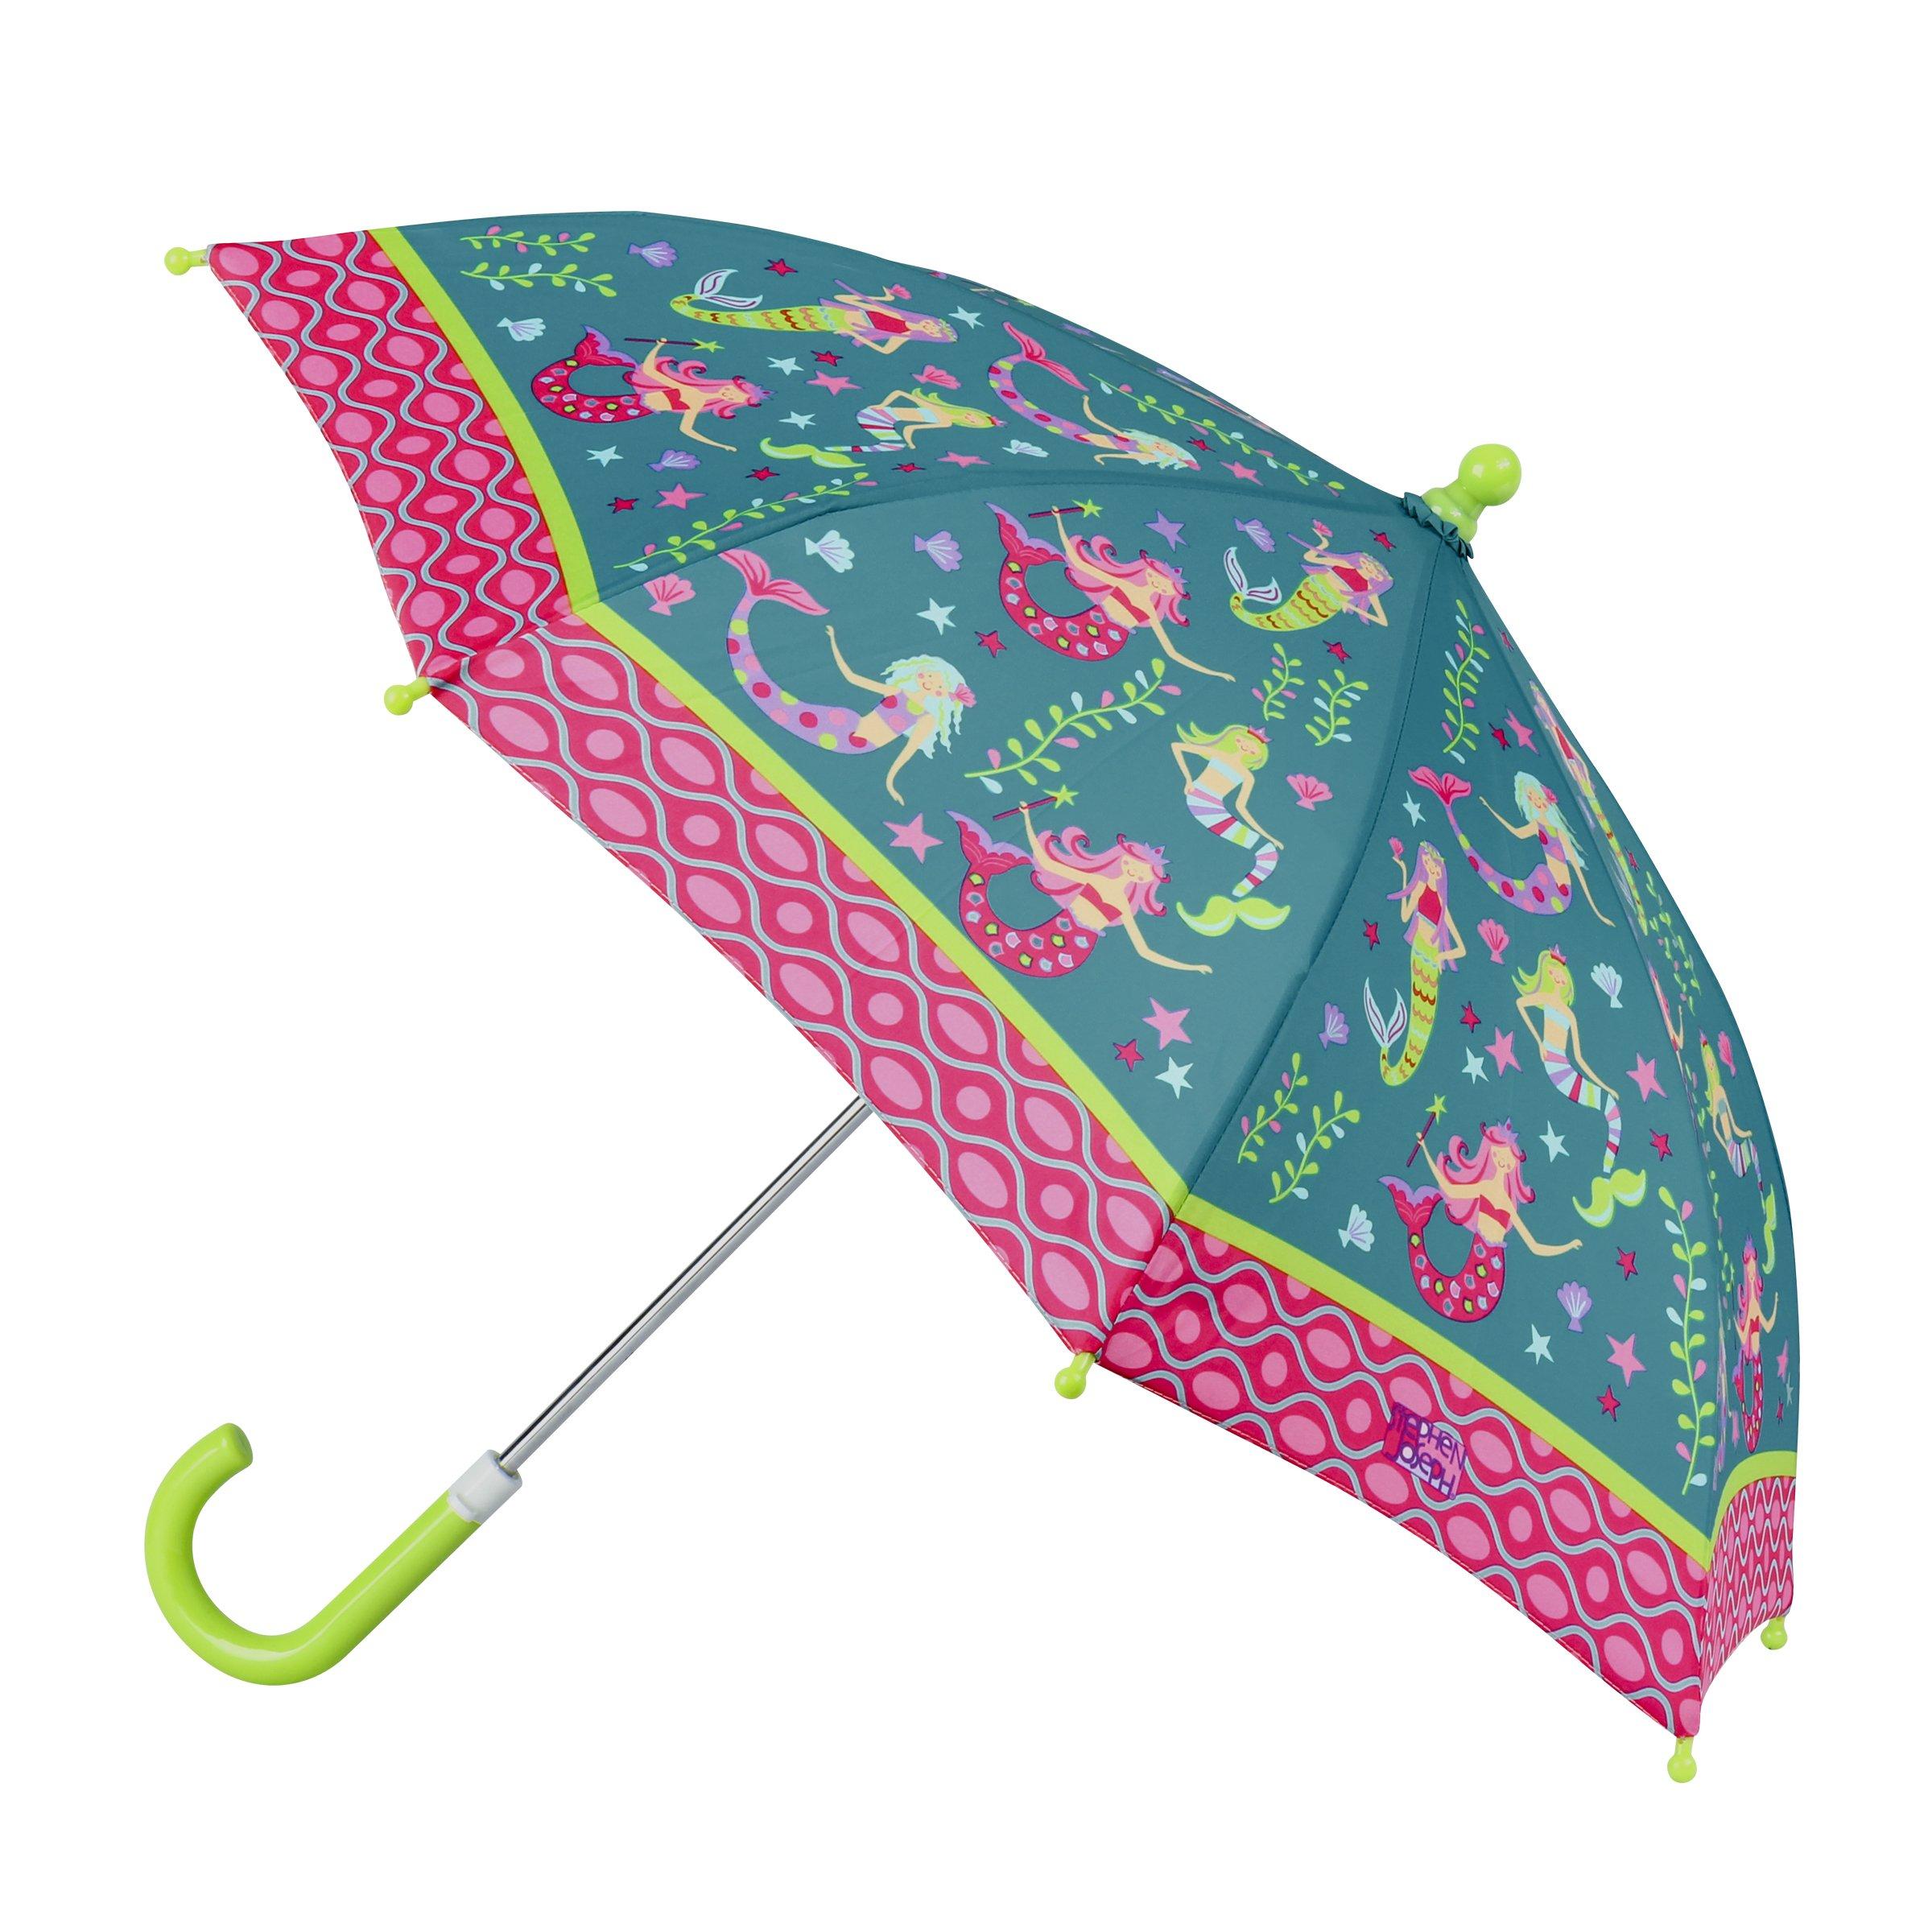 Stephen Joseph All Over Print Umbrella, Mermaid,One Size